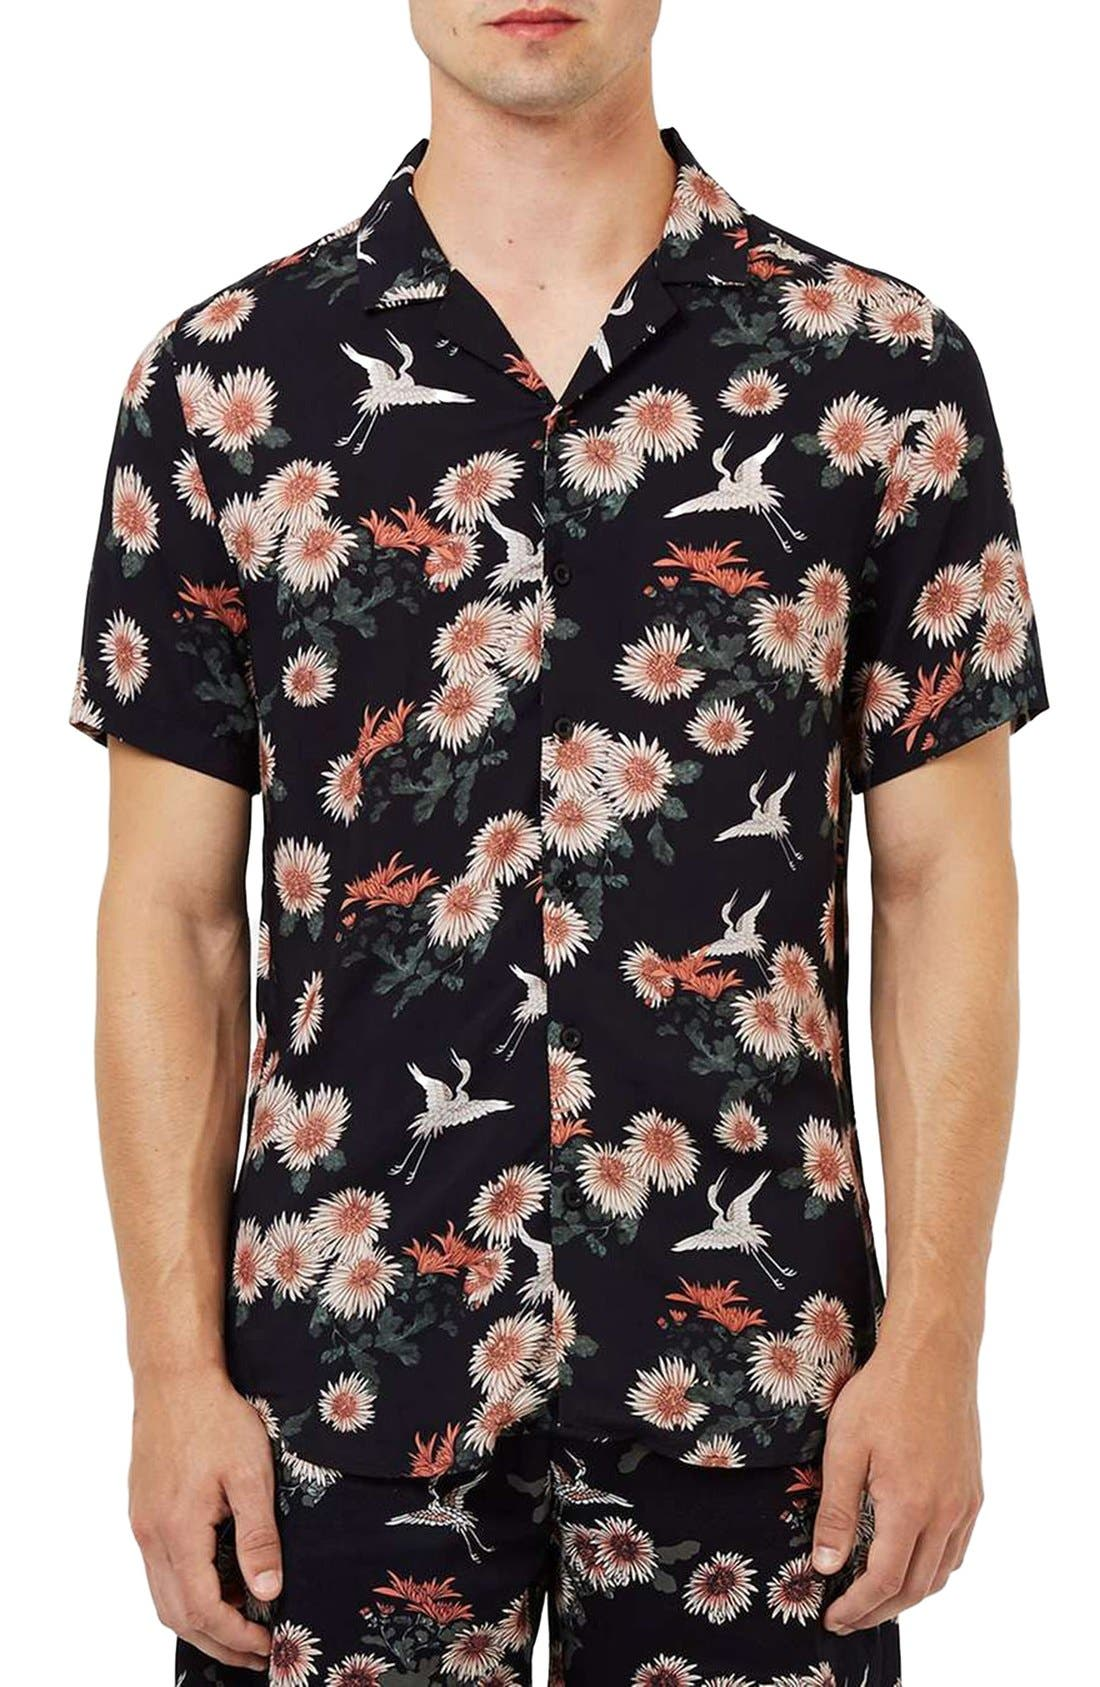 Floral Print Revere Collar Short Sleeve Shirt,                             Main thumbnail 1, color,                             001